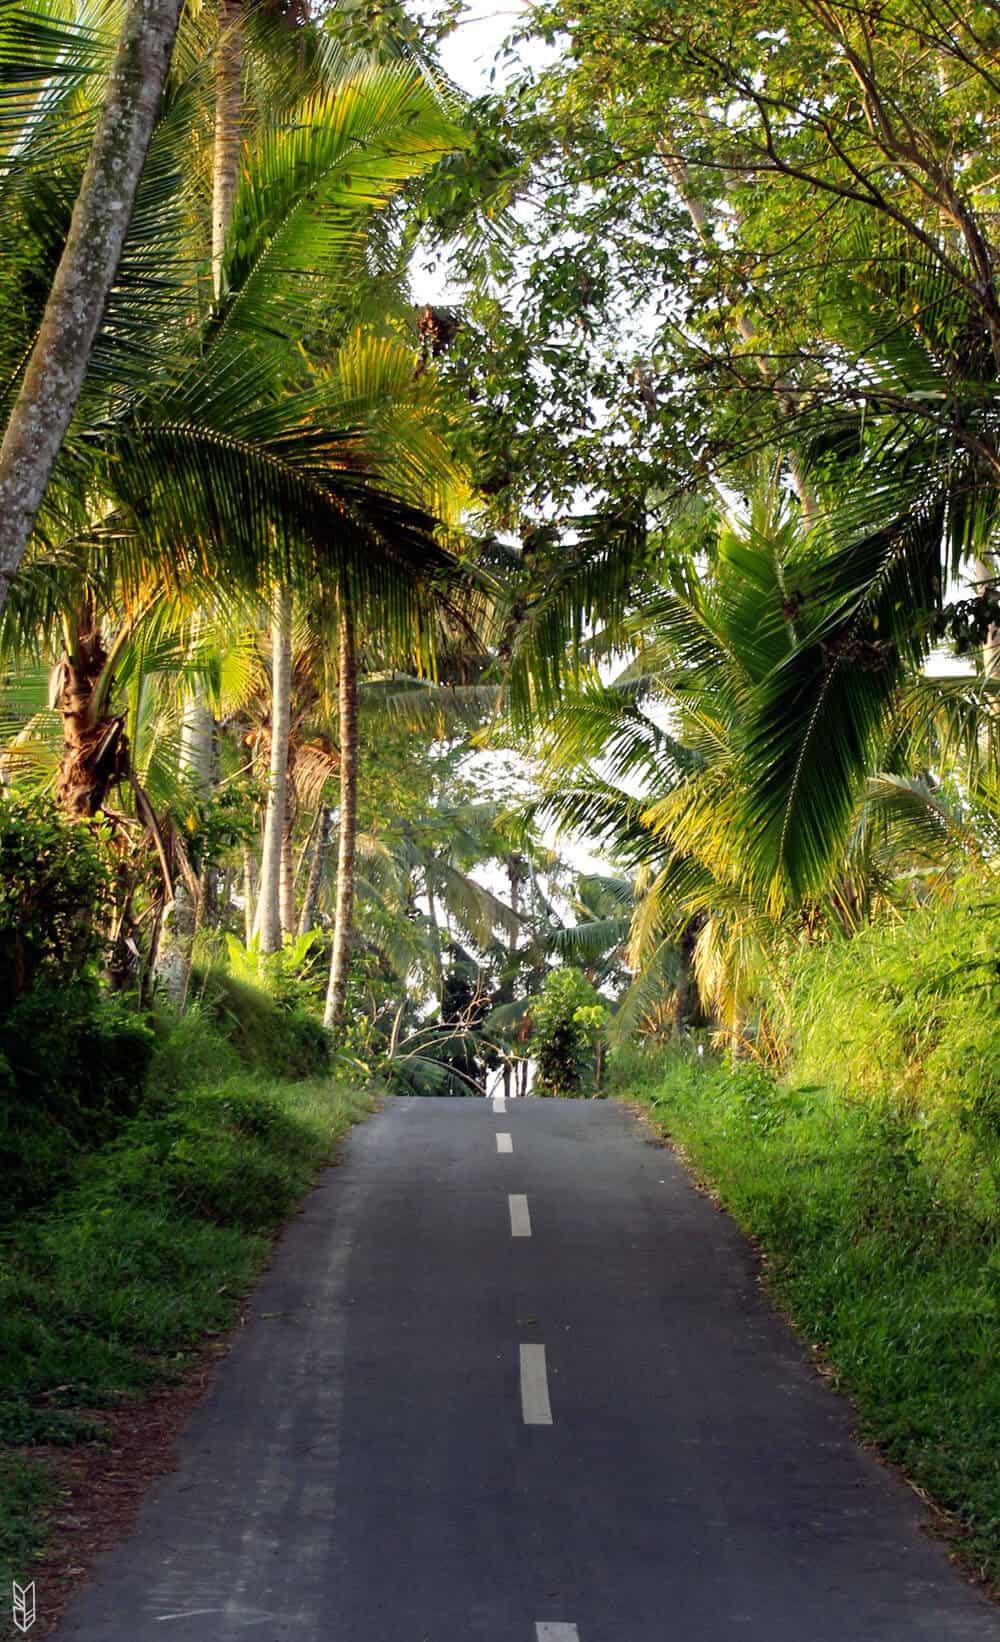 voyager à Bali en scooter